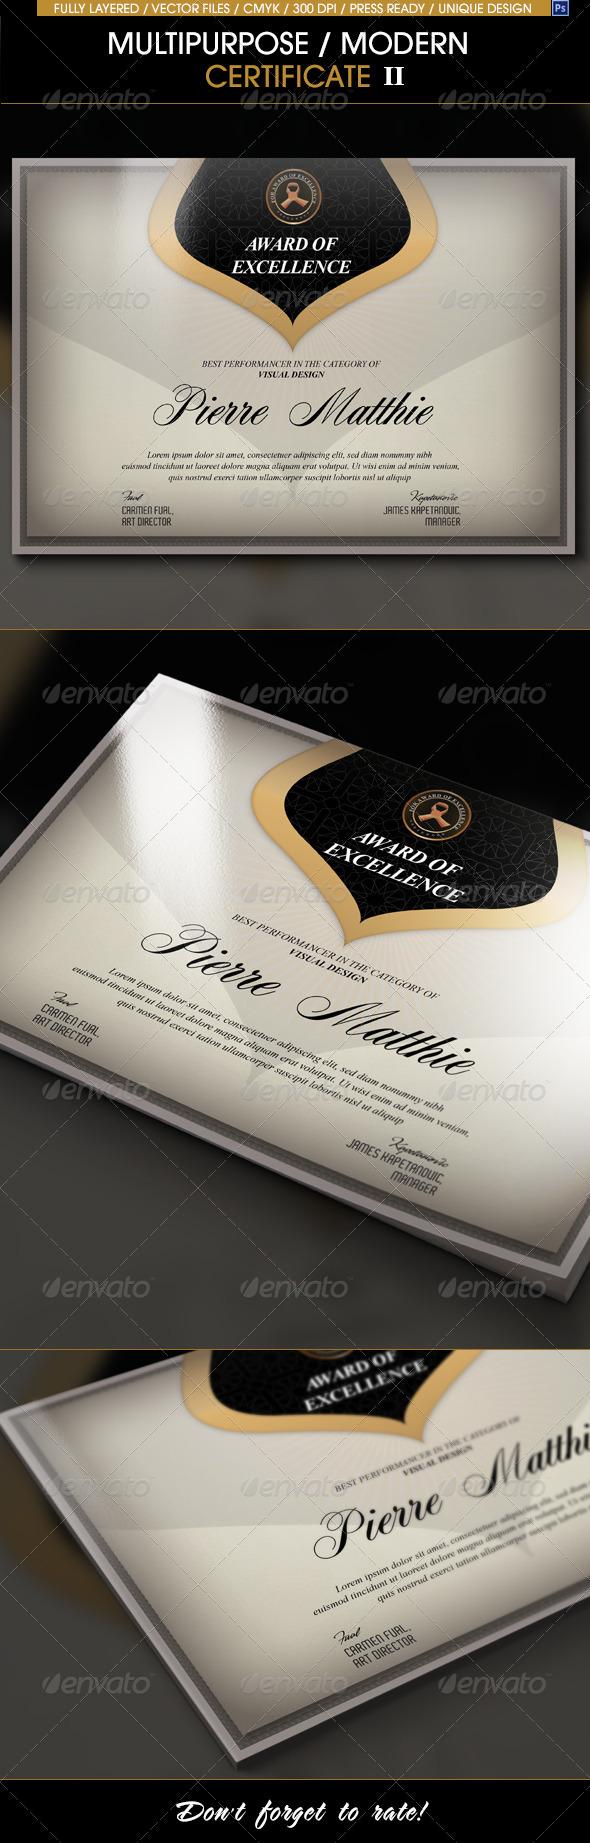 GraphicRiver Multipurpose Modern Certificate v.2 7456876